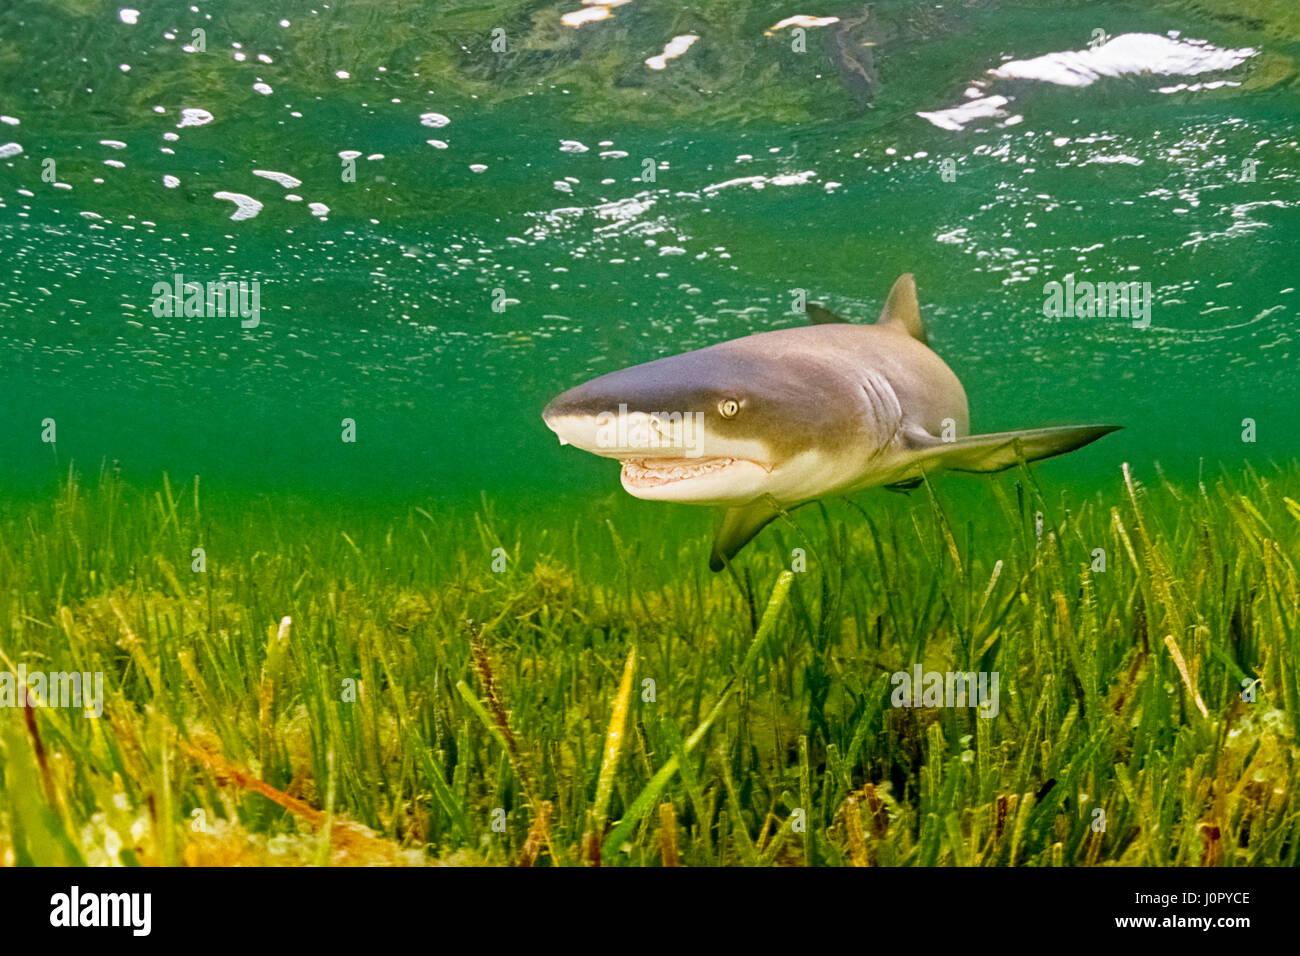 Lemon Shark, Negaprion brevirostris, Florida, USA - Stock Image